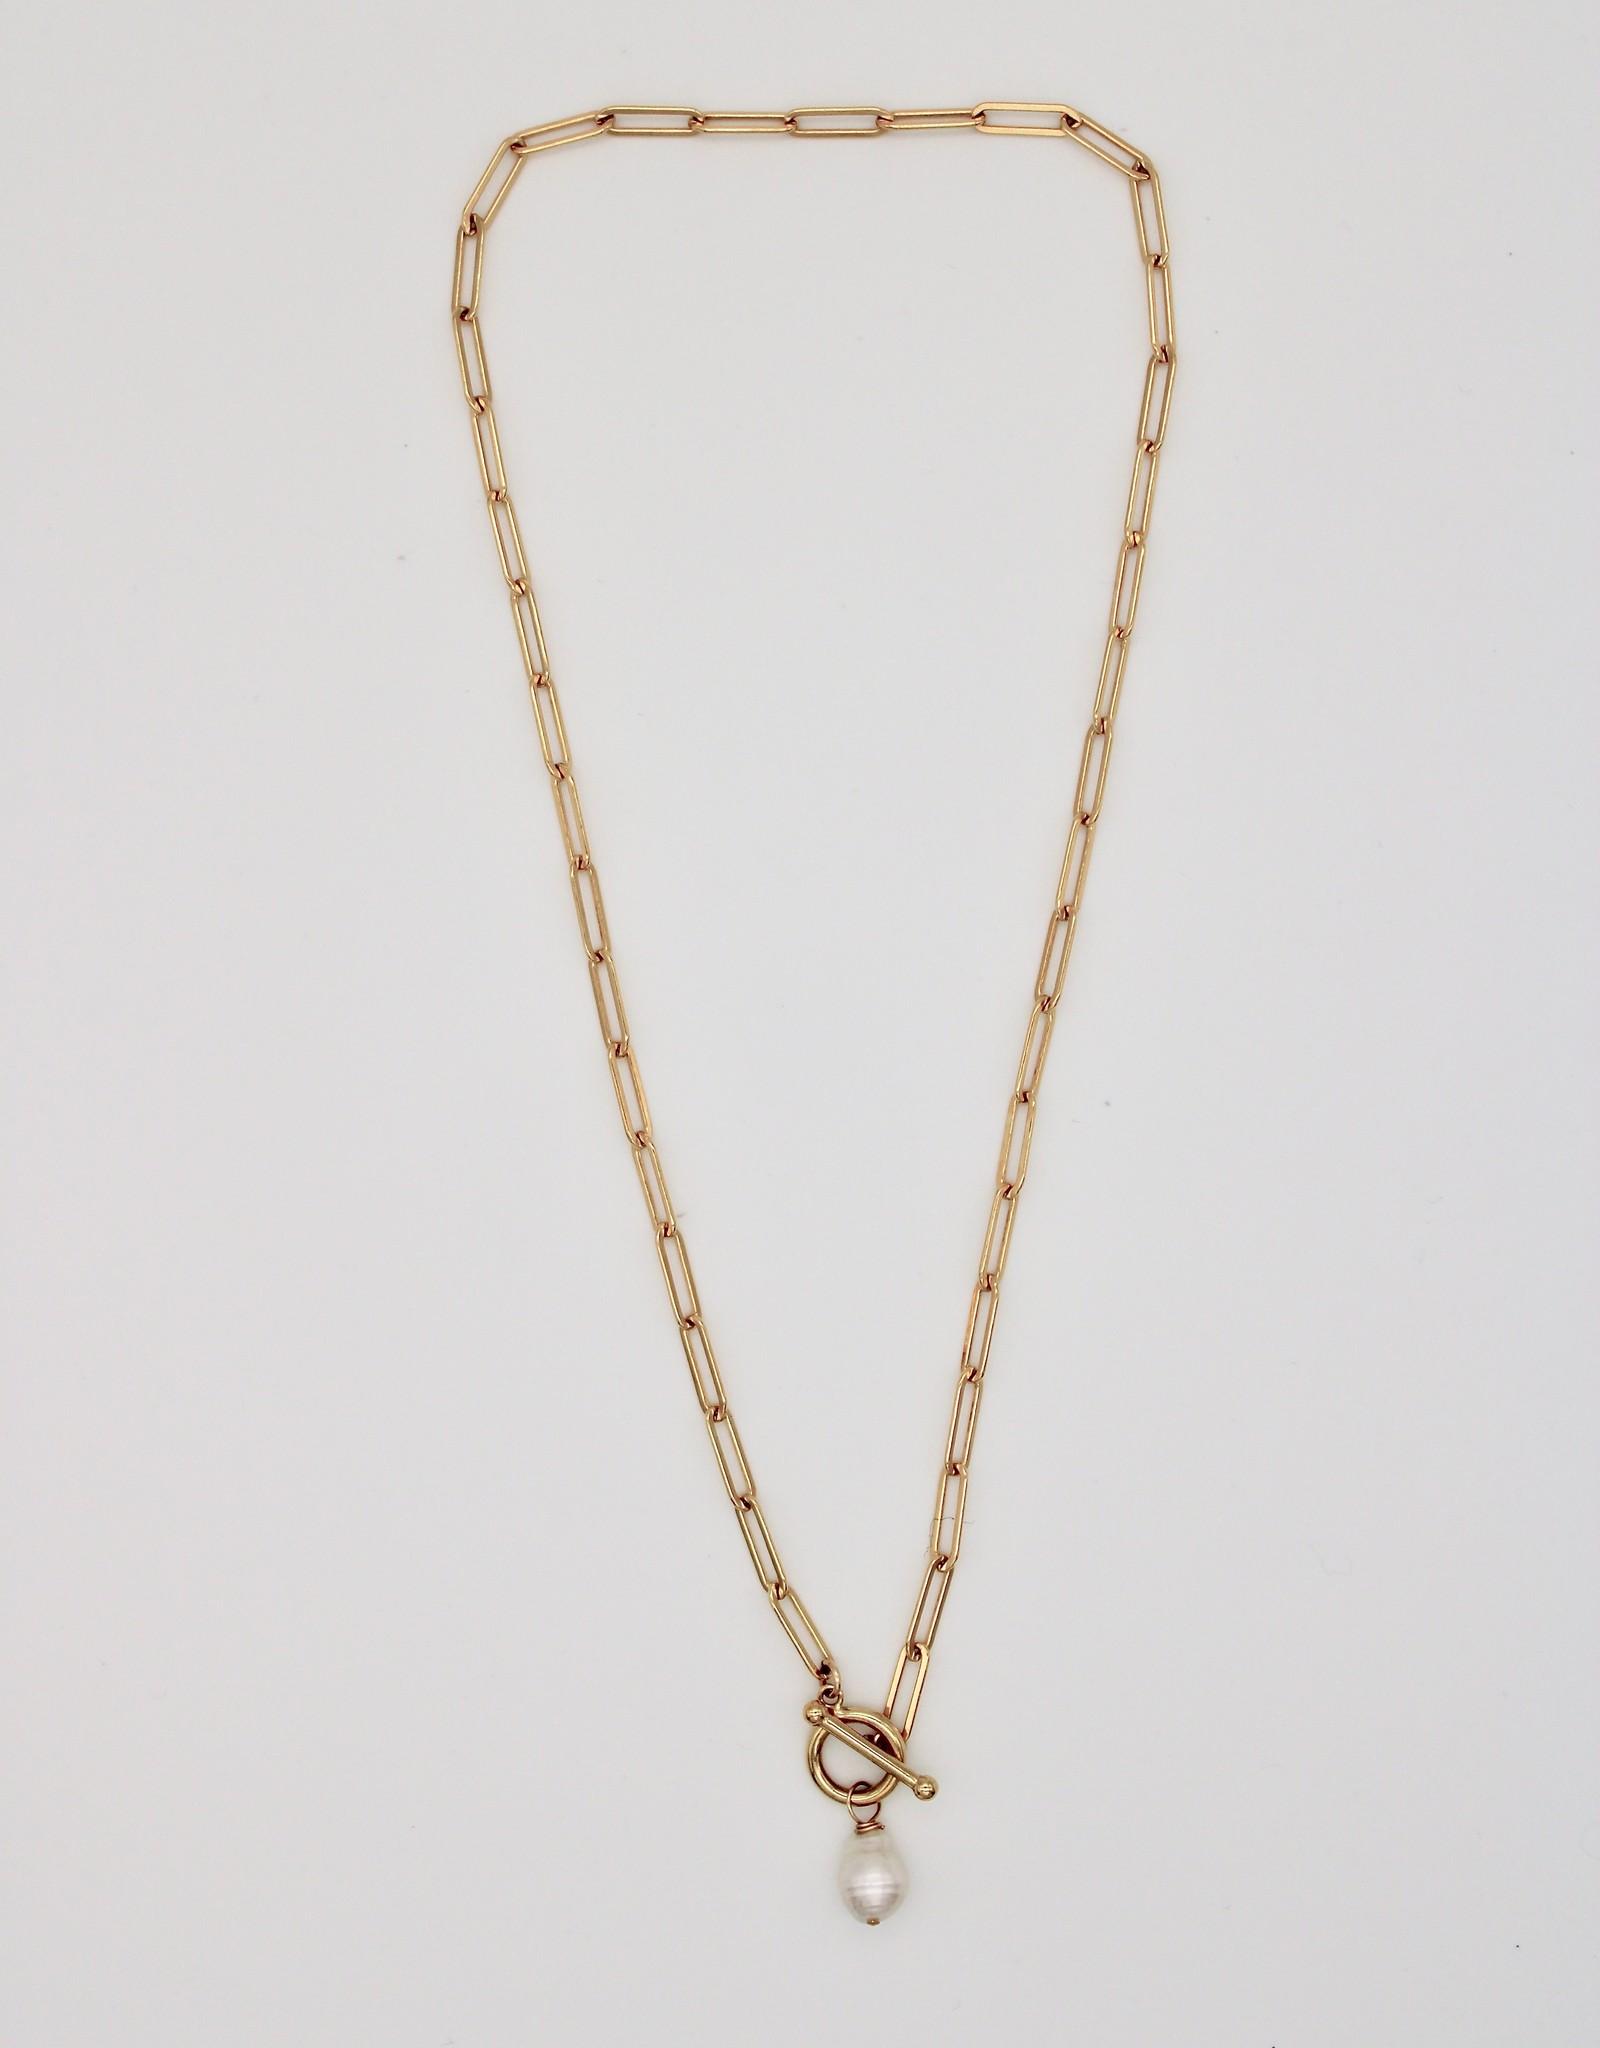 Karla Pattur KP33 Necklace w/ Saltwater Pearl